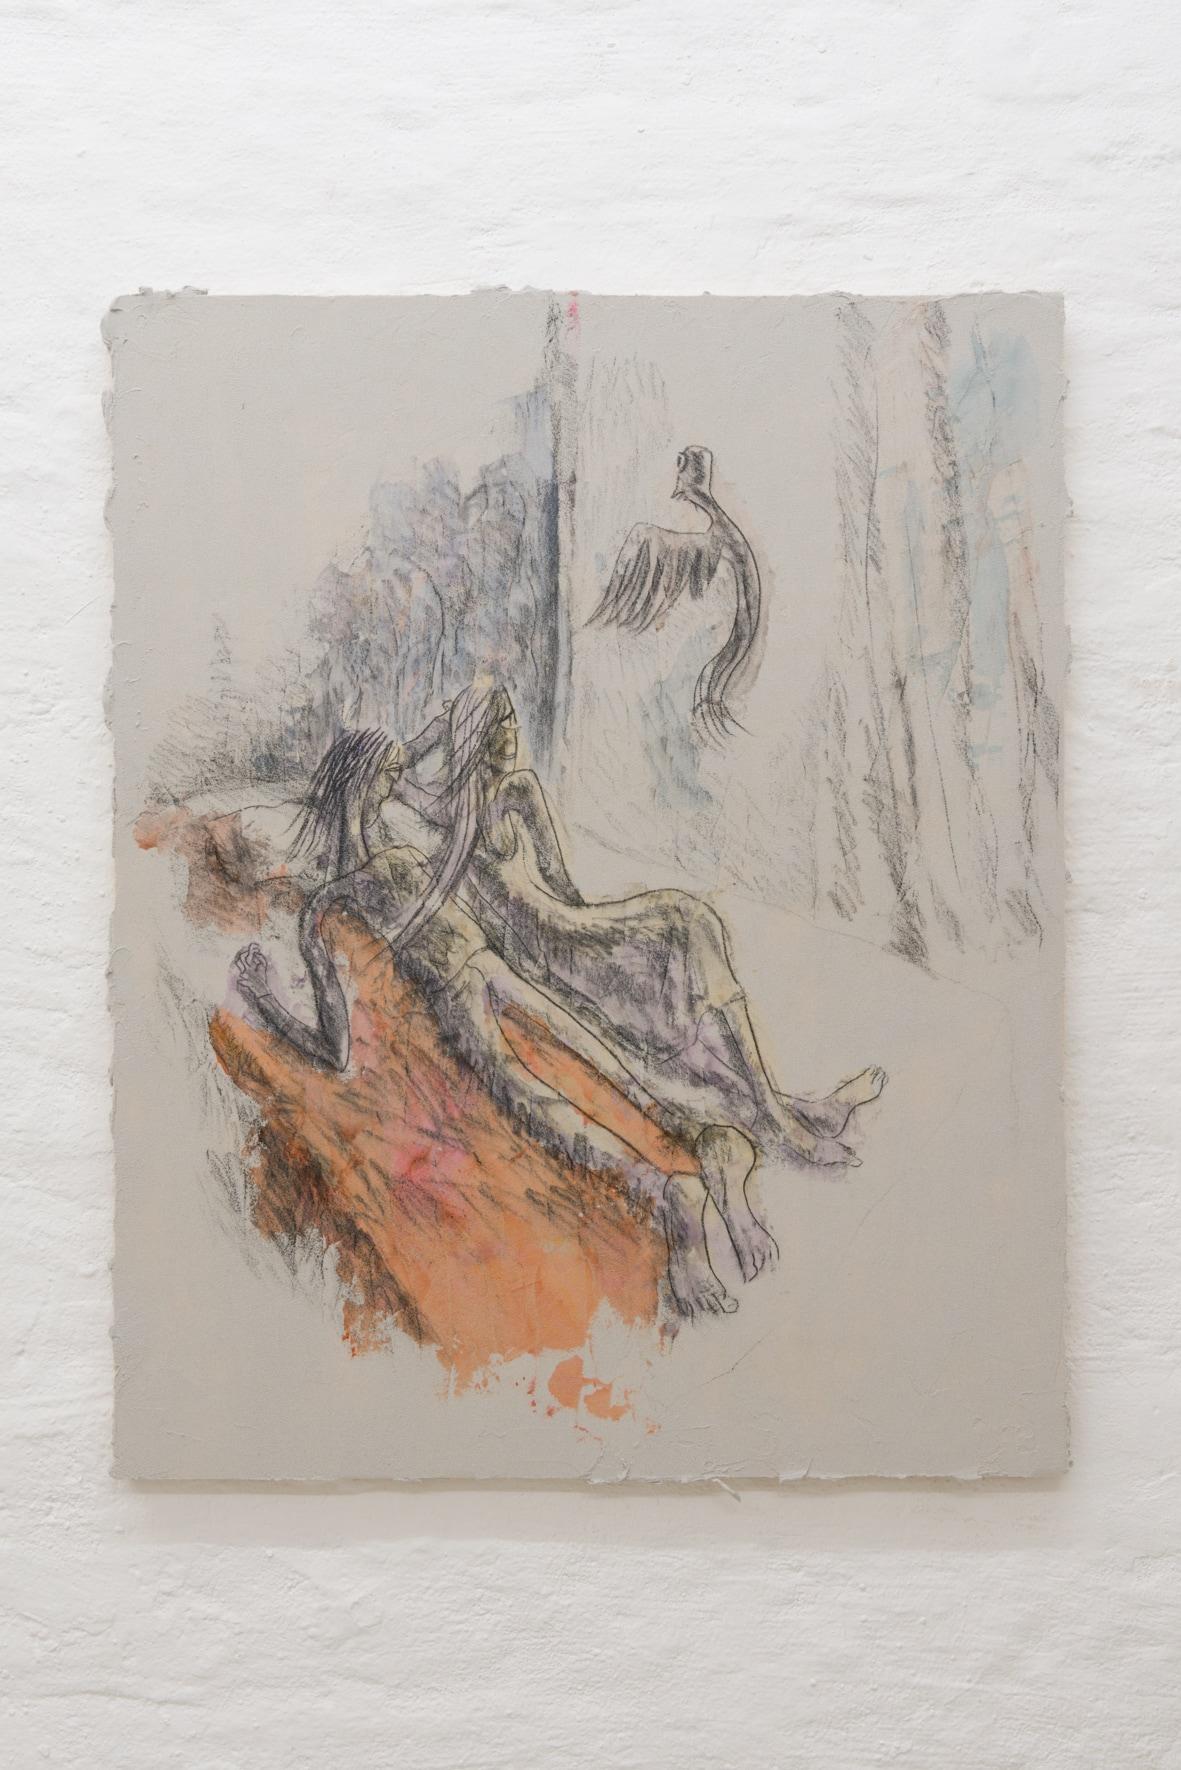 Emi Mizukami, humming bird, still alive, Acrylic and graphite on canvas, 100 x 80.5 cm, 2020